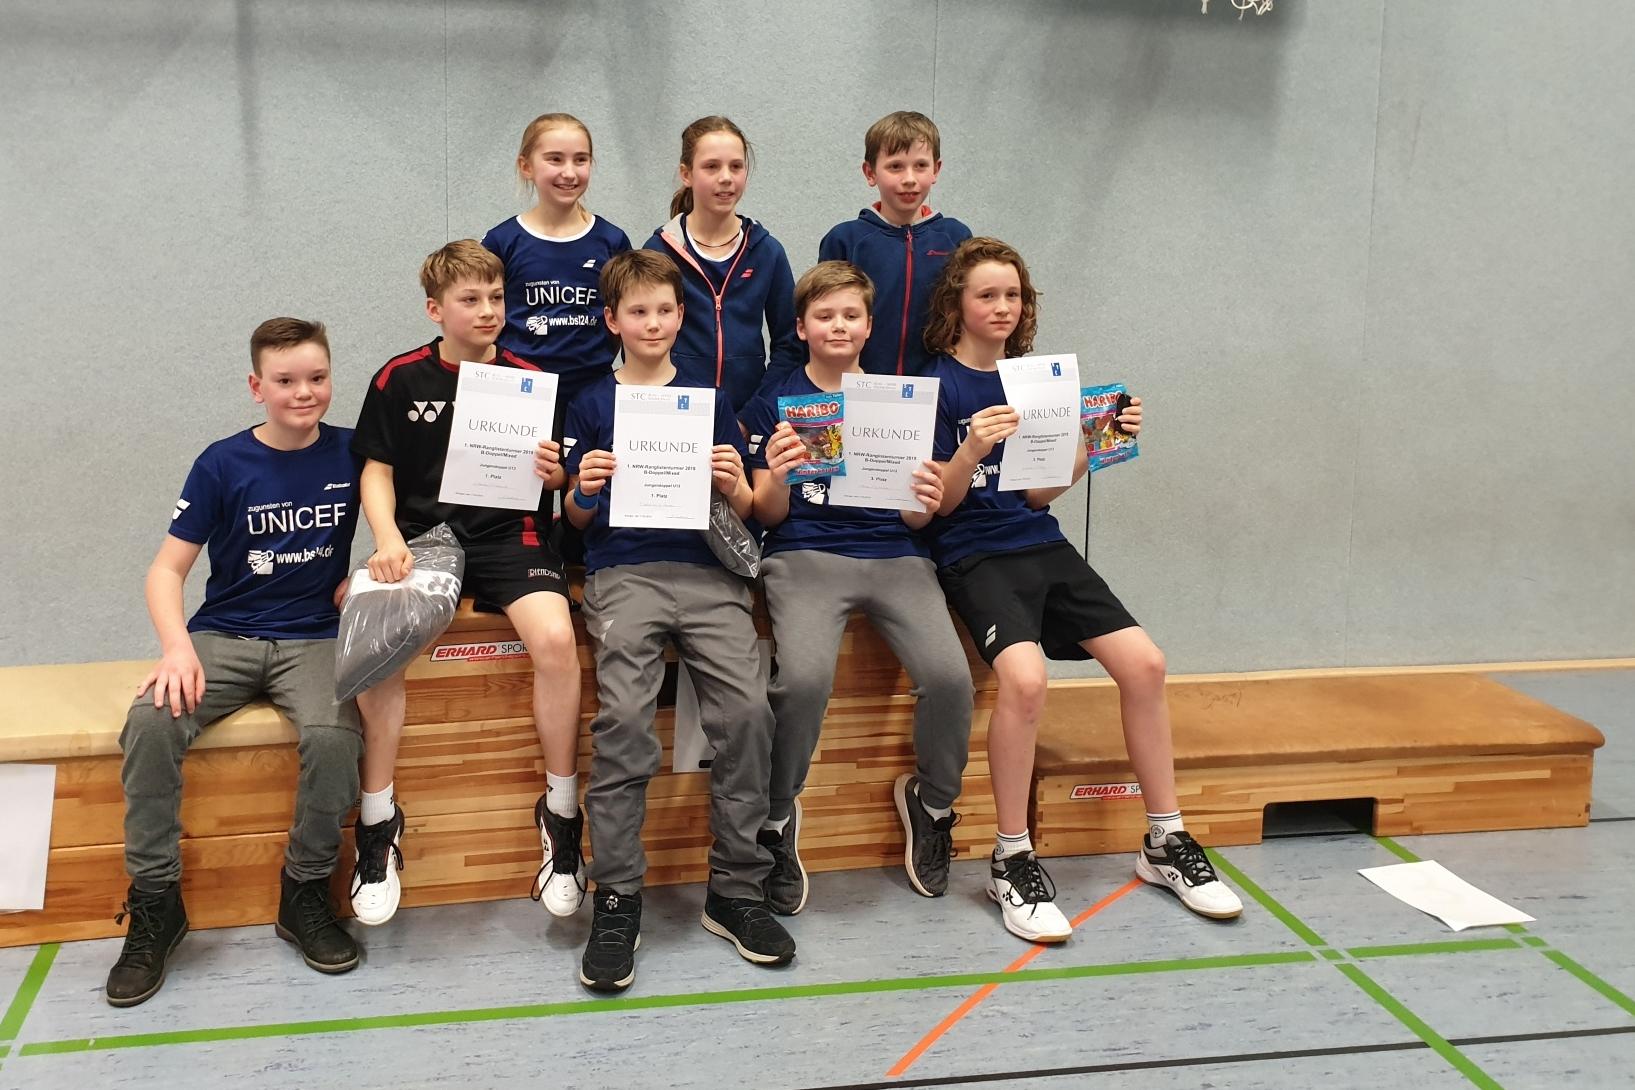 U11-13 NRW-RLT 2-2019